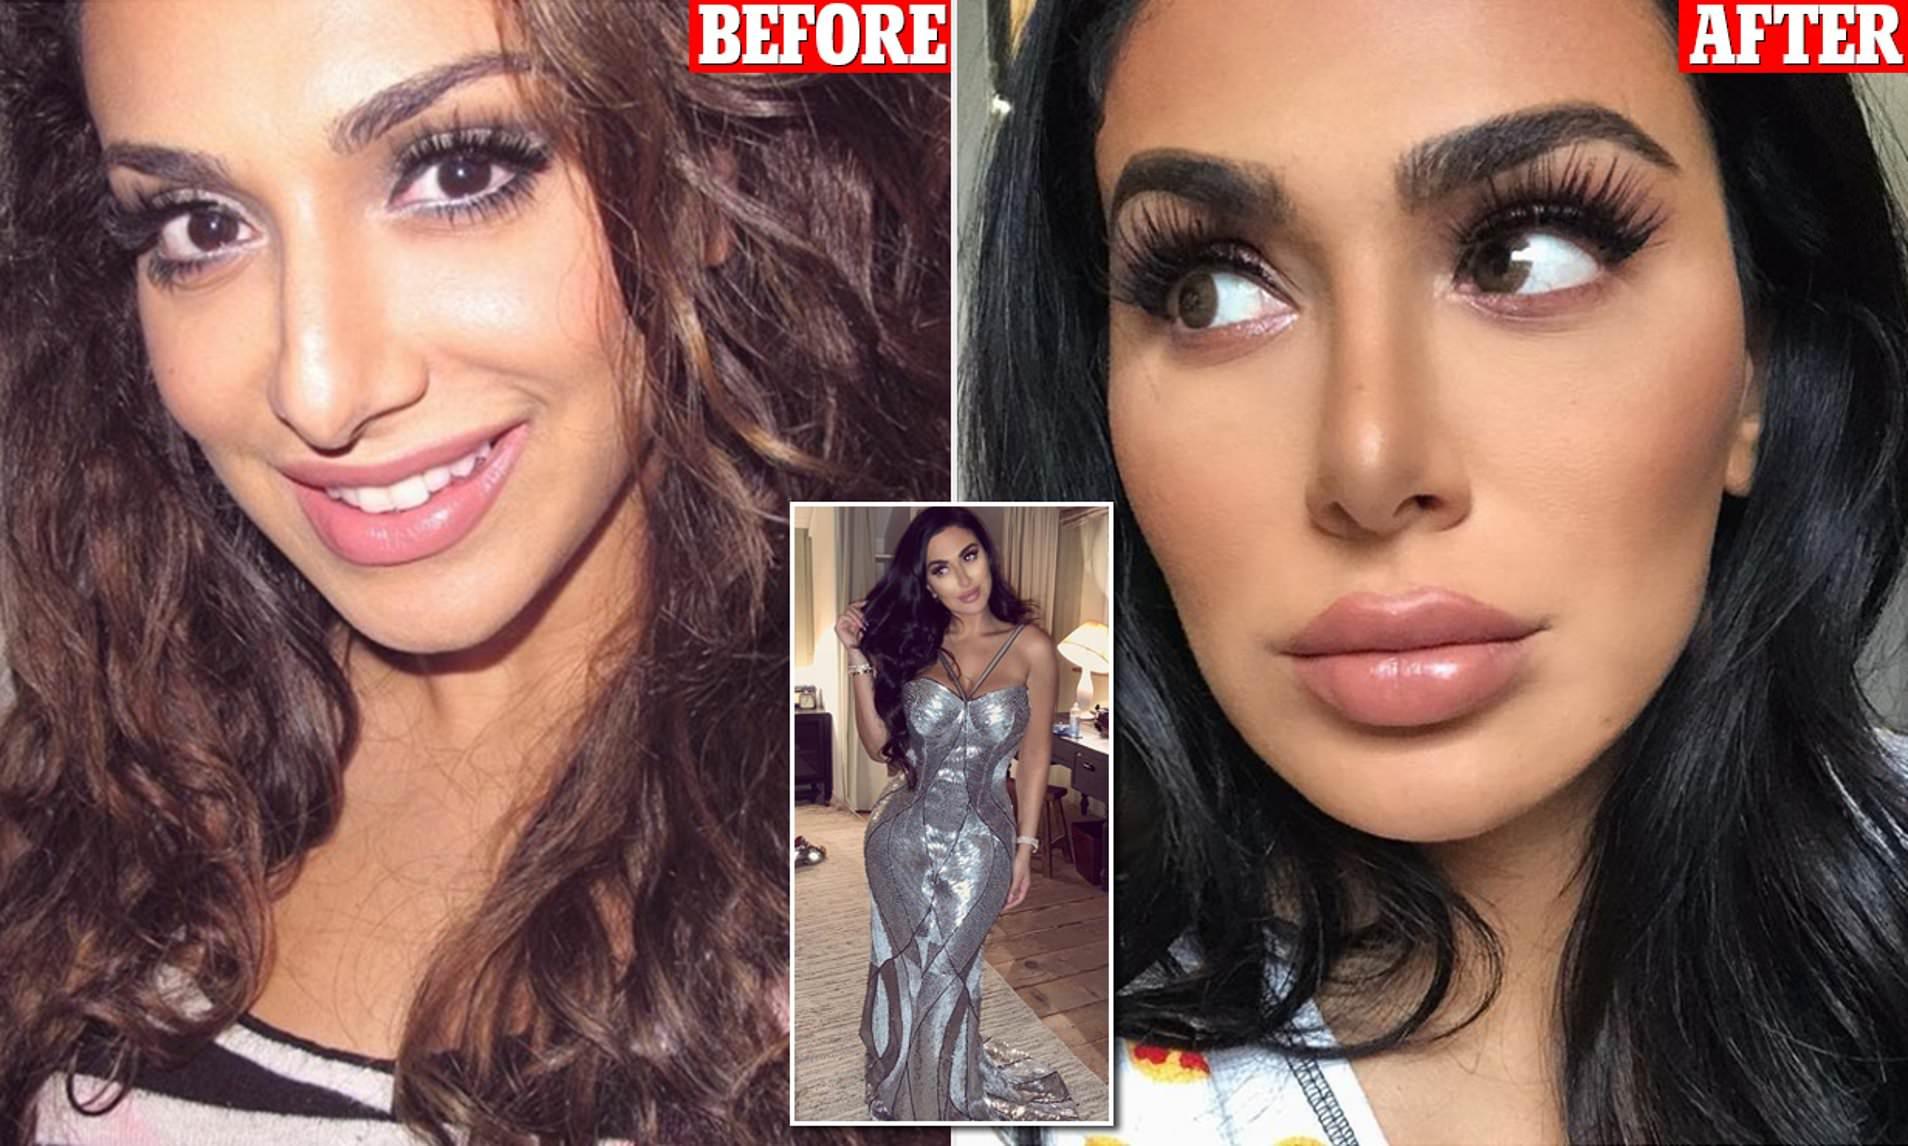 glamorous beauty blogger shares